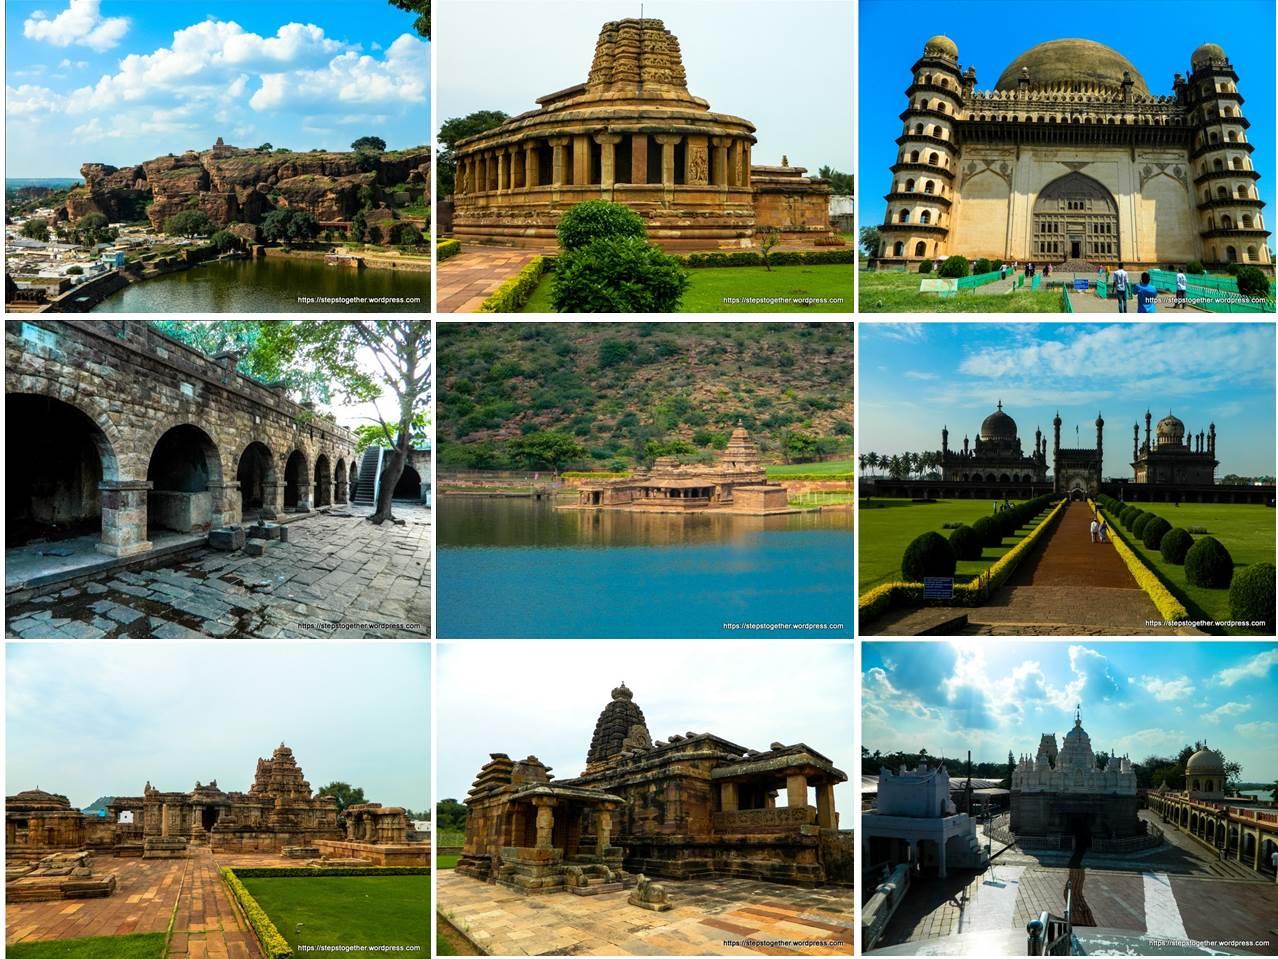 Badami, Aihole, Pattadakal, and Bijapur monuments